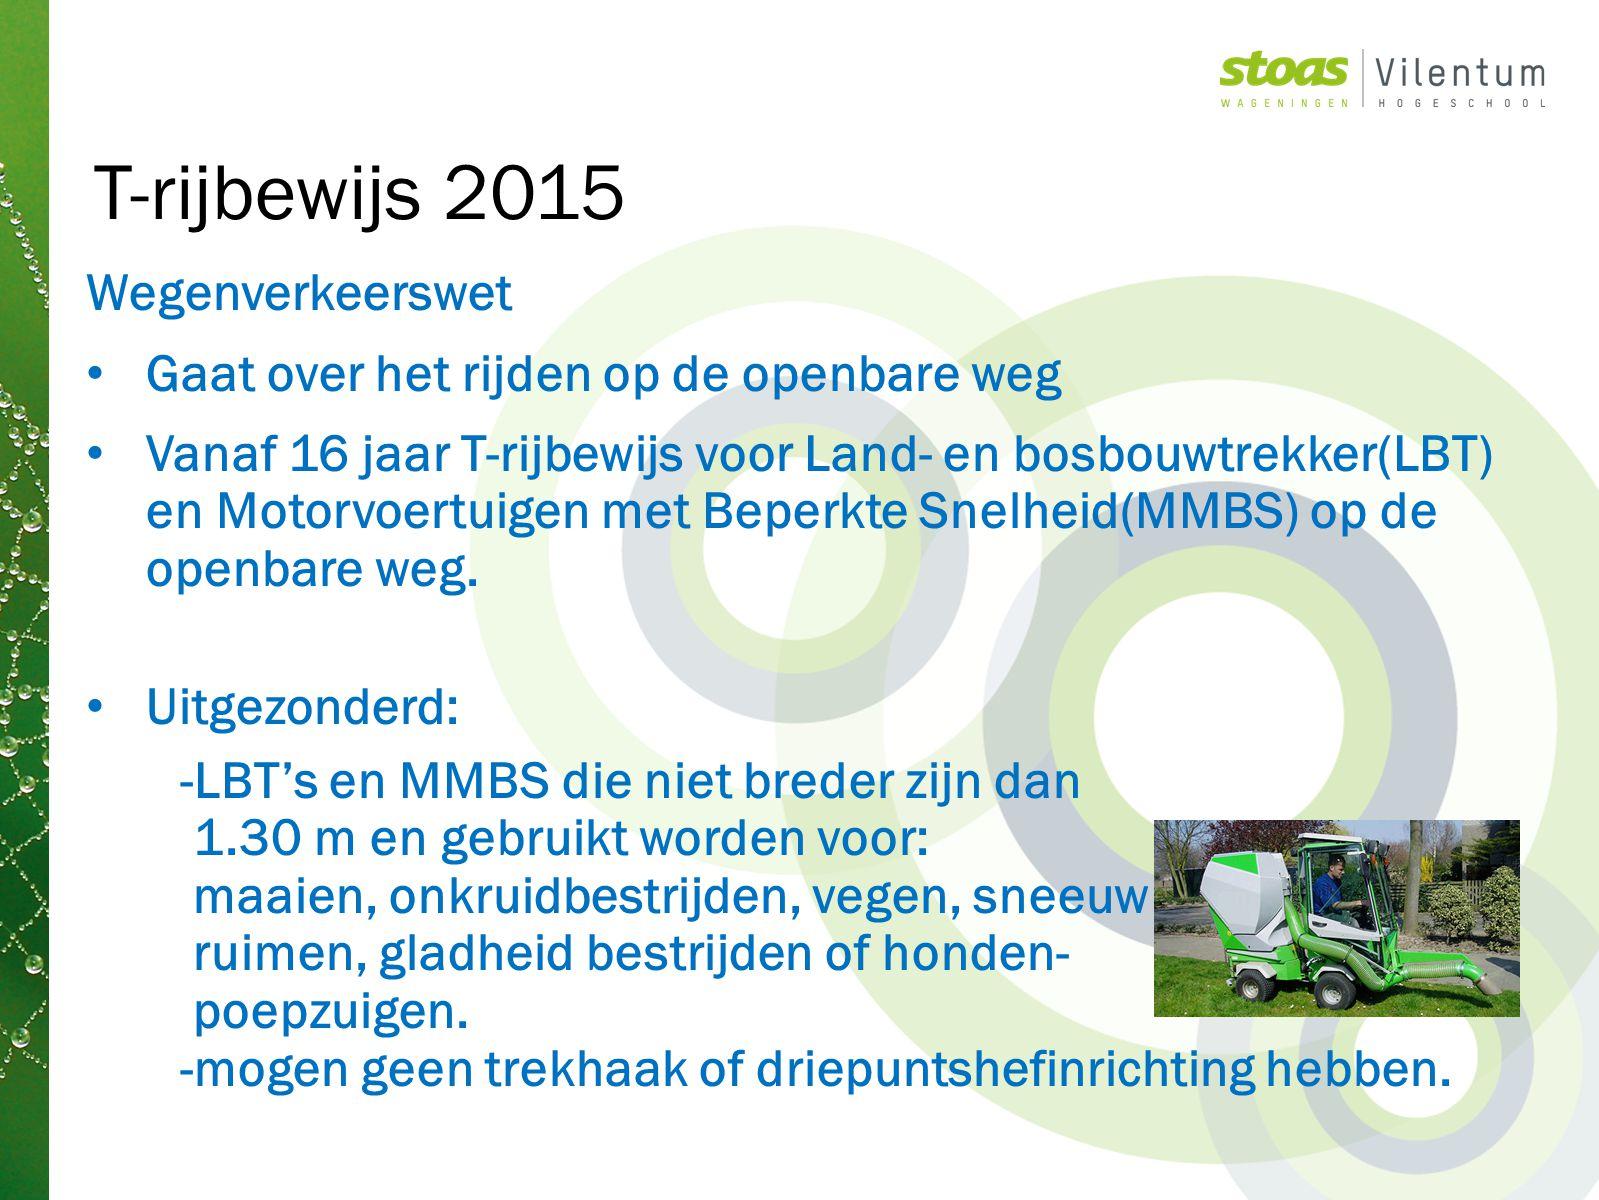 T-rijbewijs 2015 Wegenverkeerswet